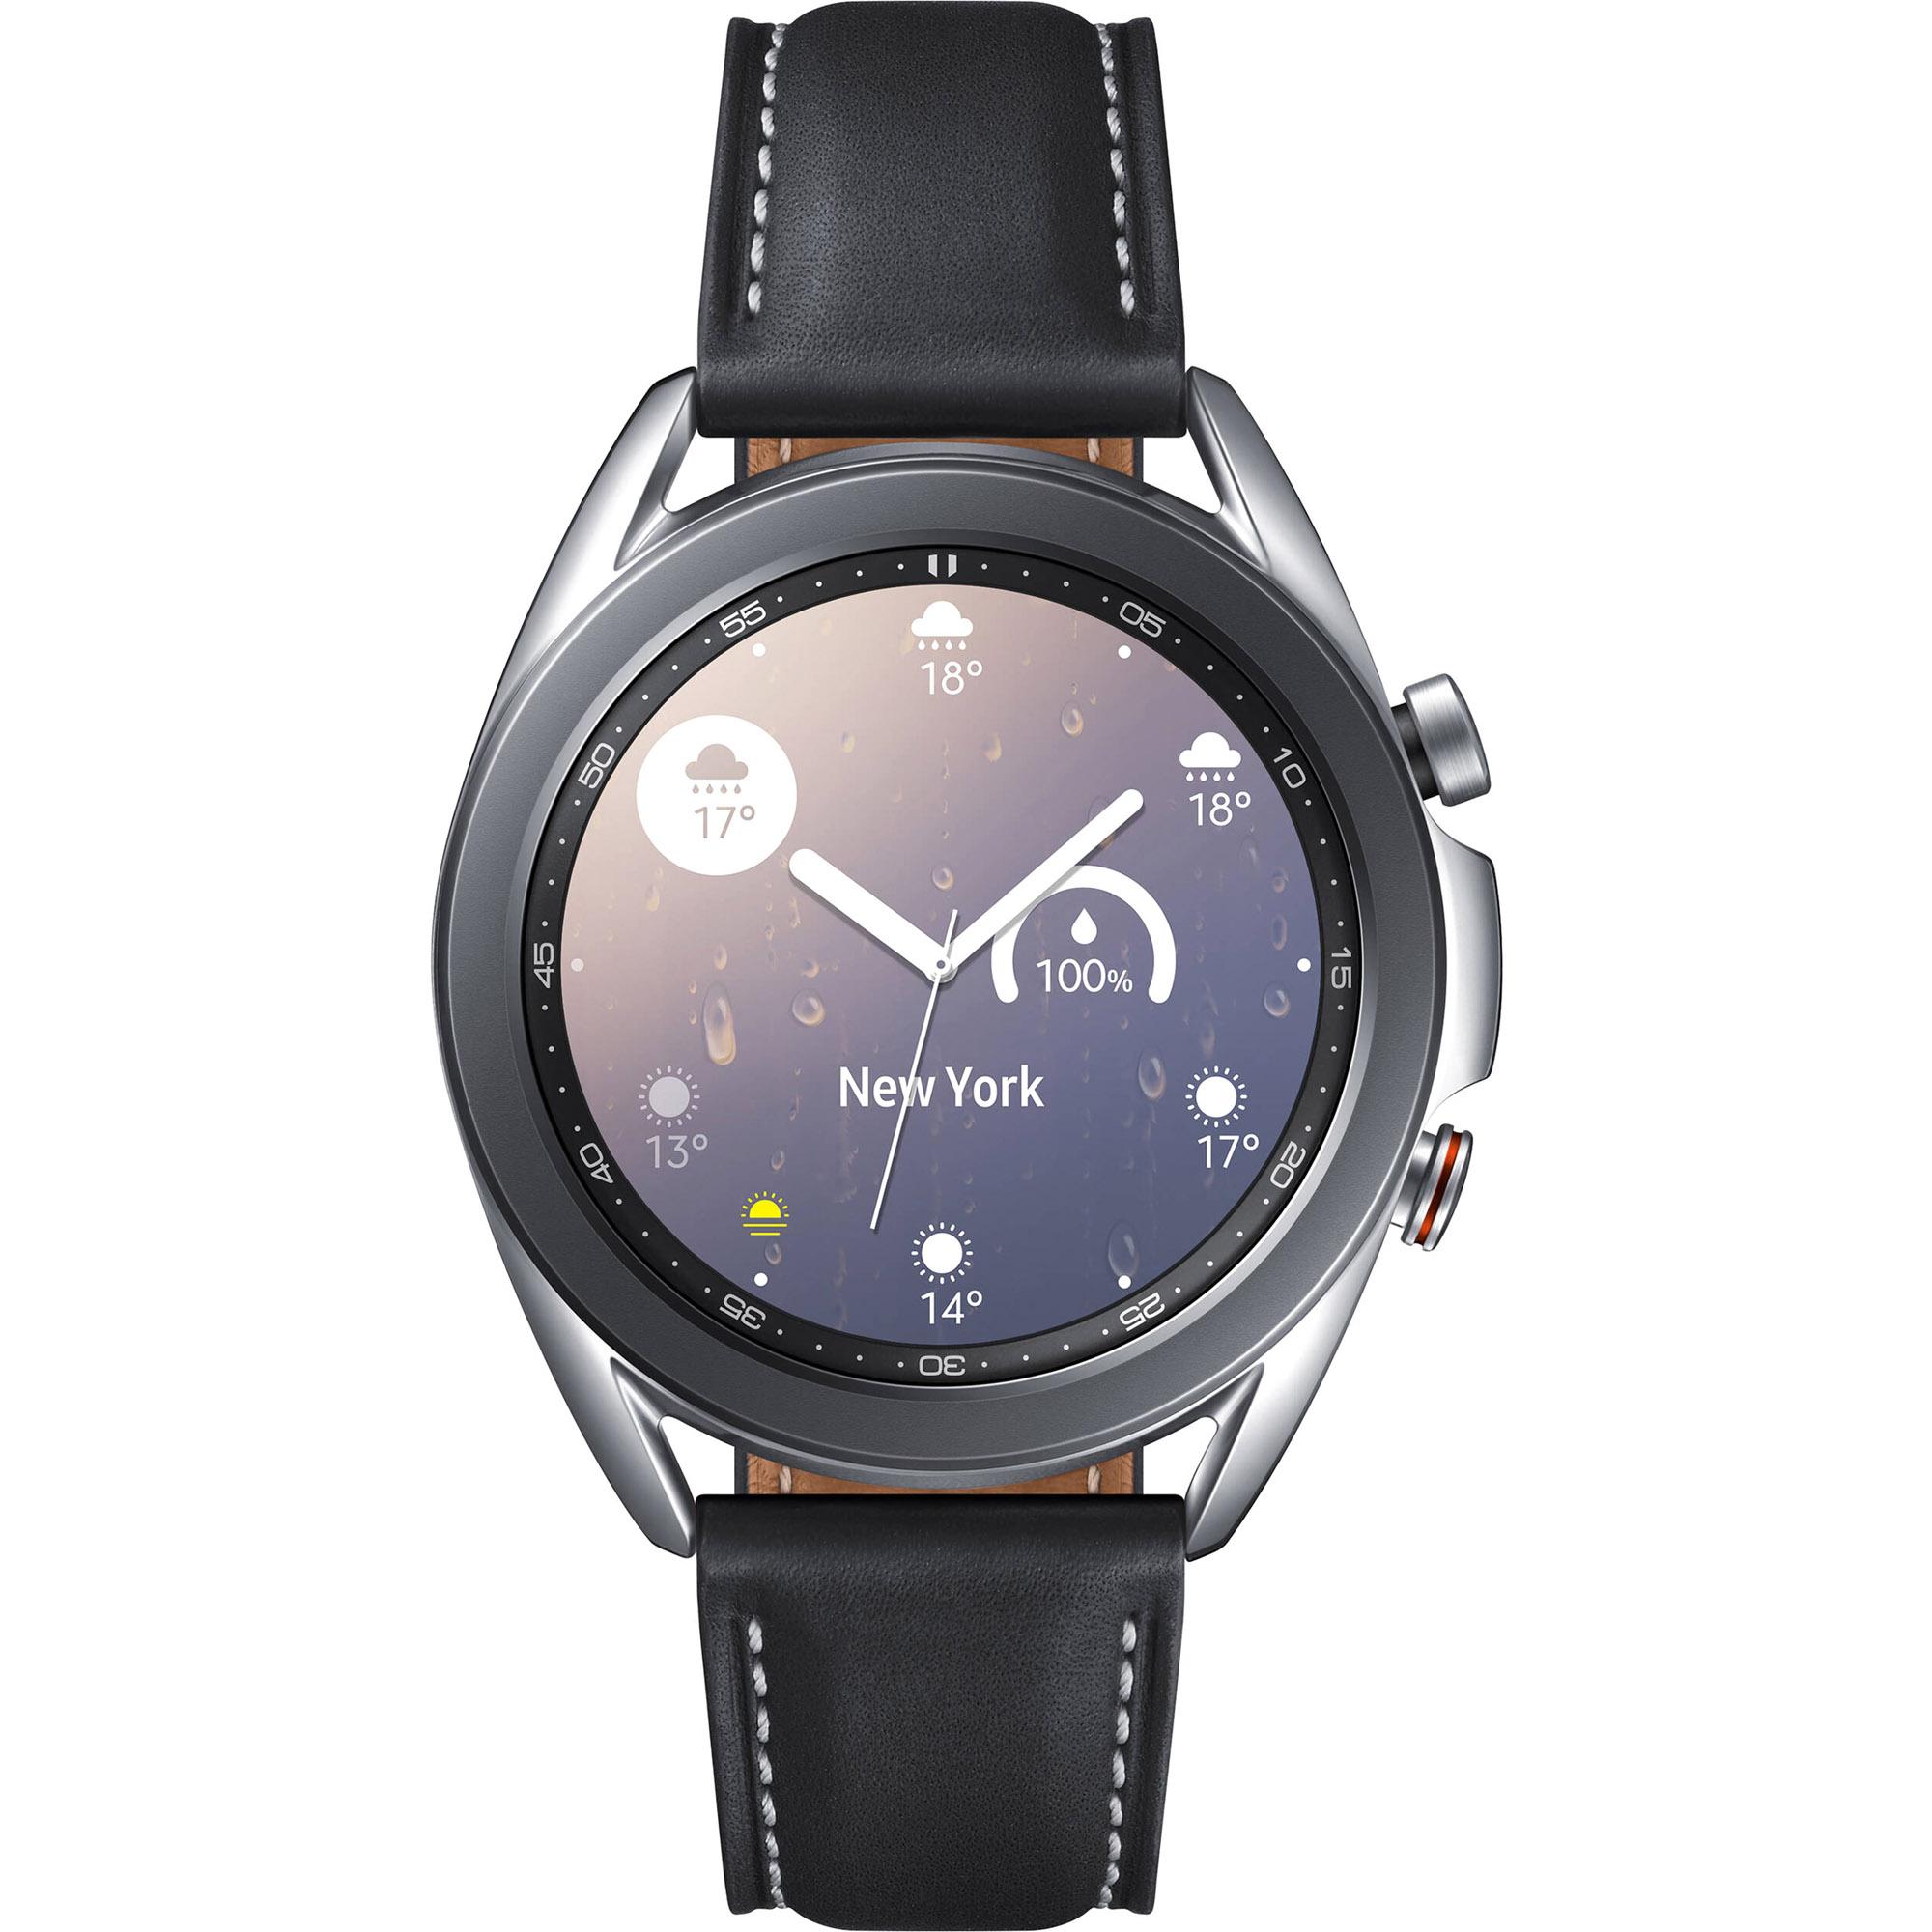 Фото - Смарт-часы Samsung Galaxy Watch3 41 мм (SM-R850NZSACIS) Серебро смарт часы samsung galaxy watch 1 3 super amoled серебристый sm r800nzsaser